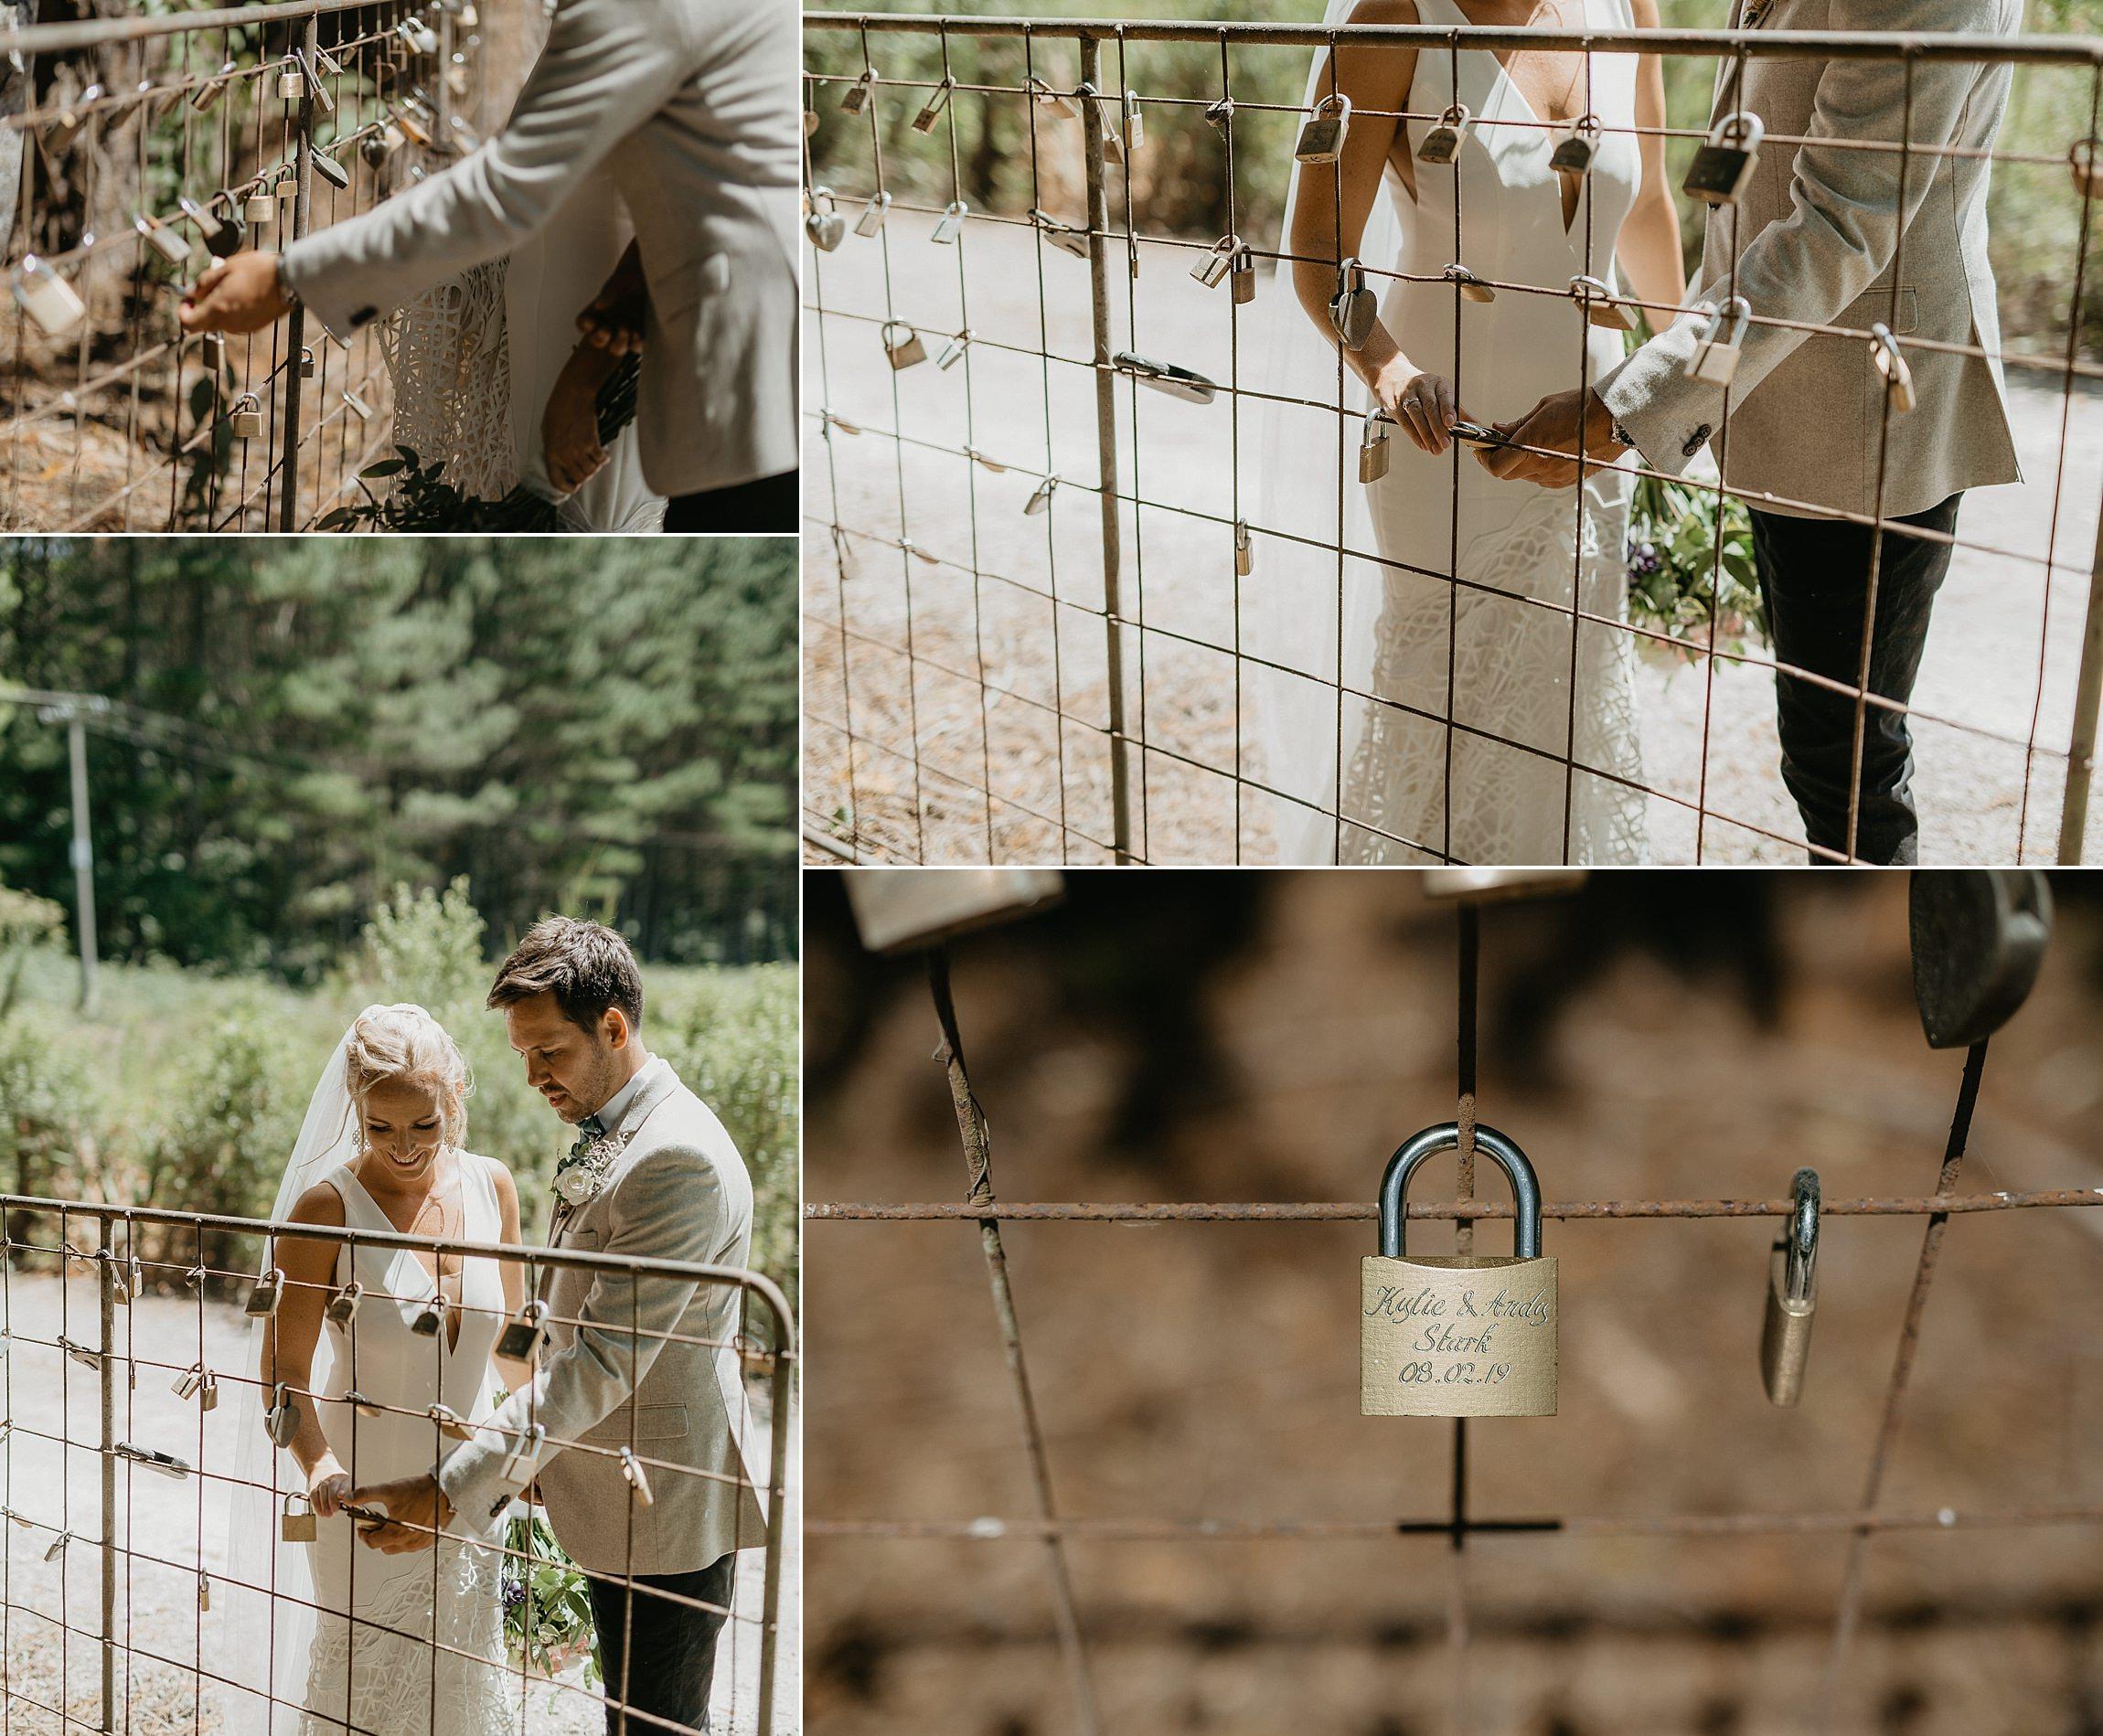 oldforestschool-wedding-blog-74.jpg